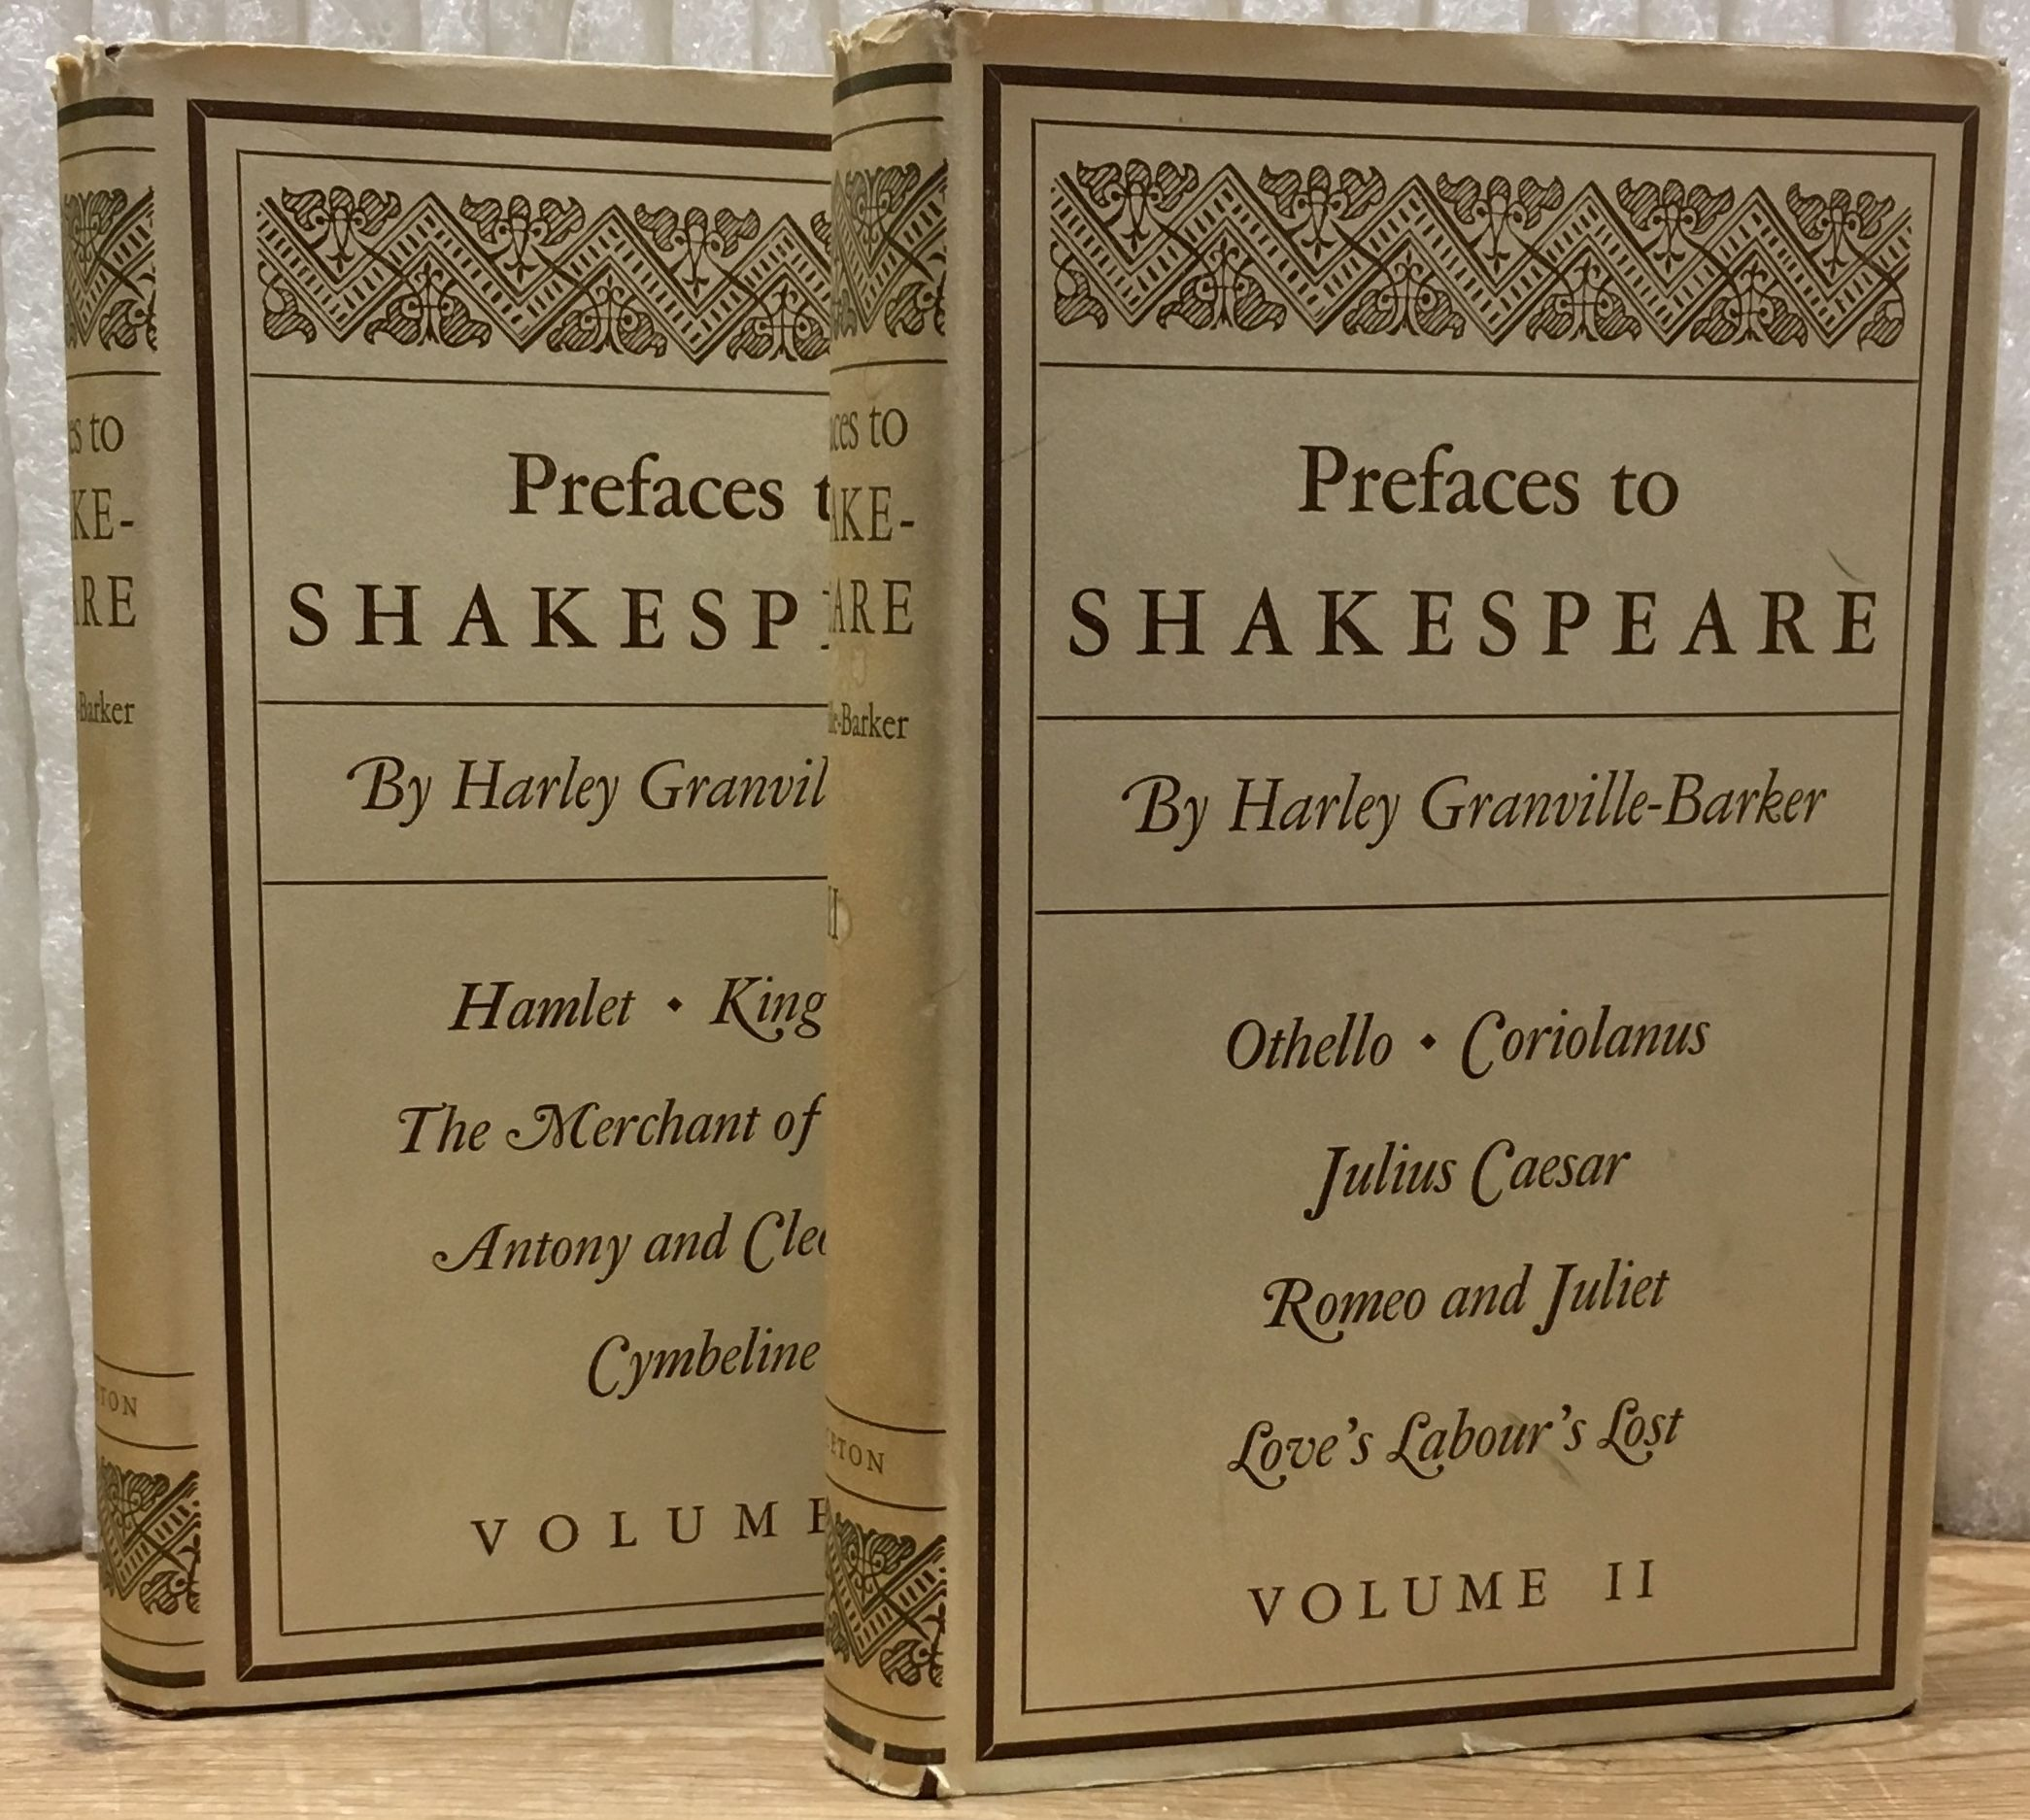 Prefaces to Shakespeare, 2 Vols.--Vol 1: Hamlet, King Lear, The Merchant of Venice, Antony and Cleopatra, Cymbeline; Vol 2: Othello, Coriolanus, Julius Caesar, Romeo and Juliet, Love's Labour's Lost, Granville-Barker, Harley; William Shakespeare